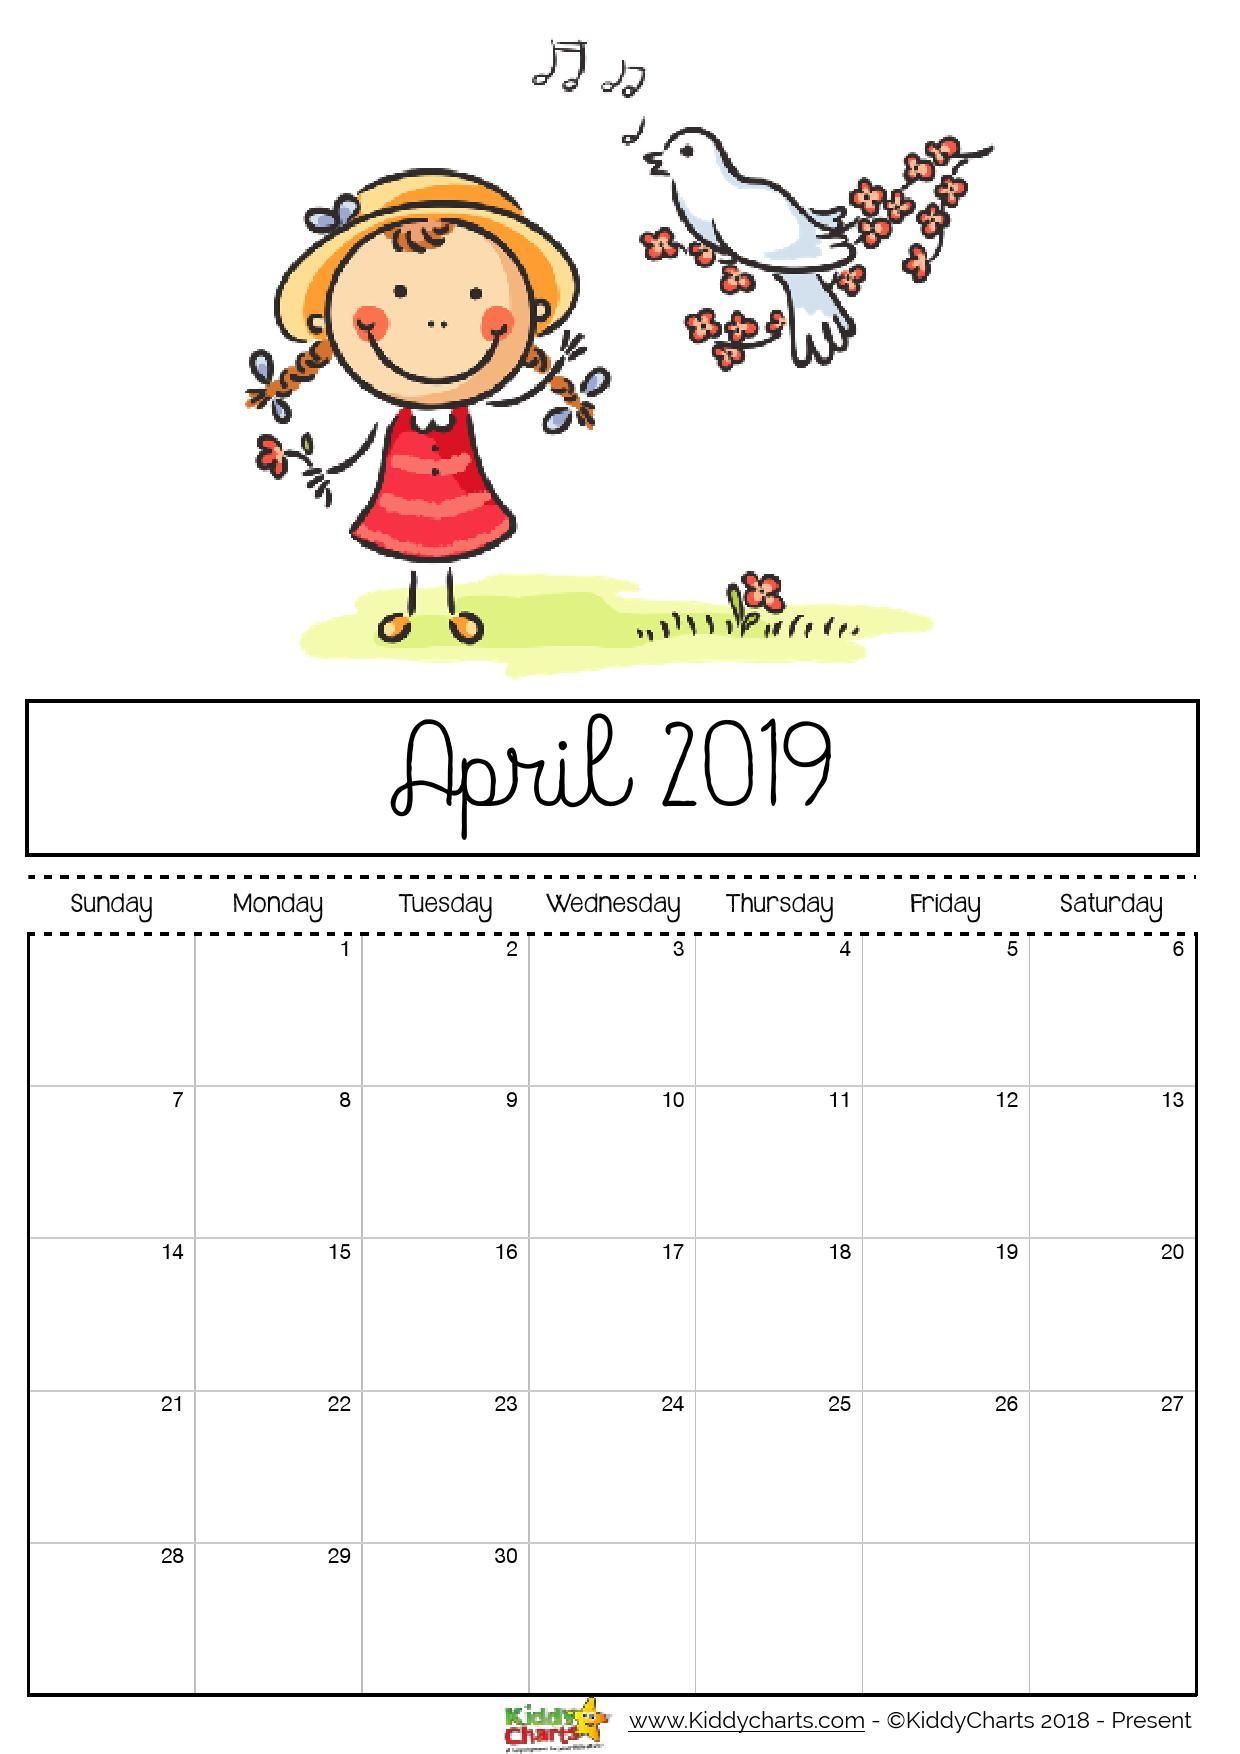 Printable Calendar 2019 for Kids